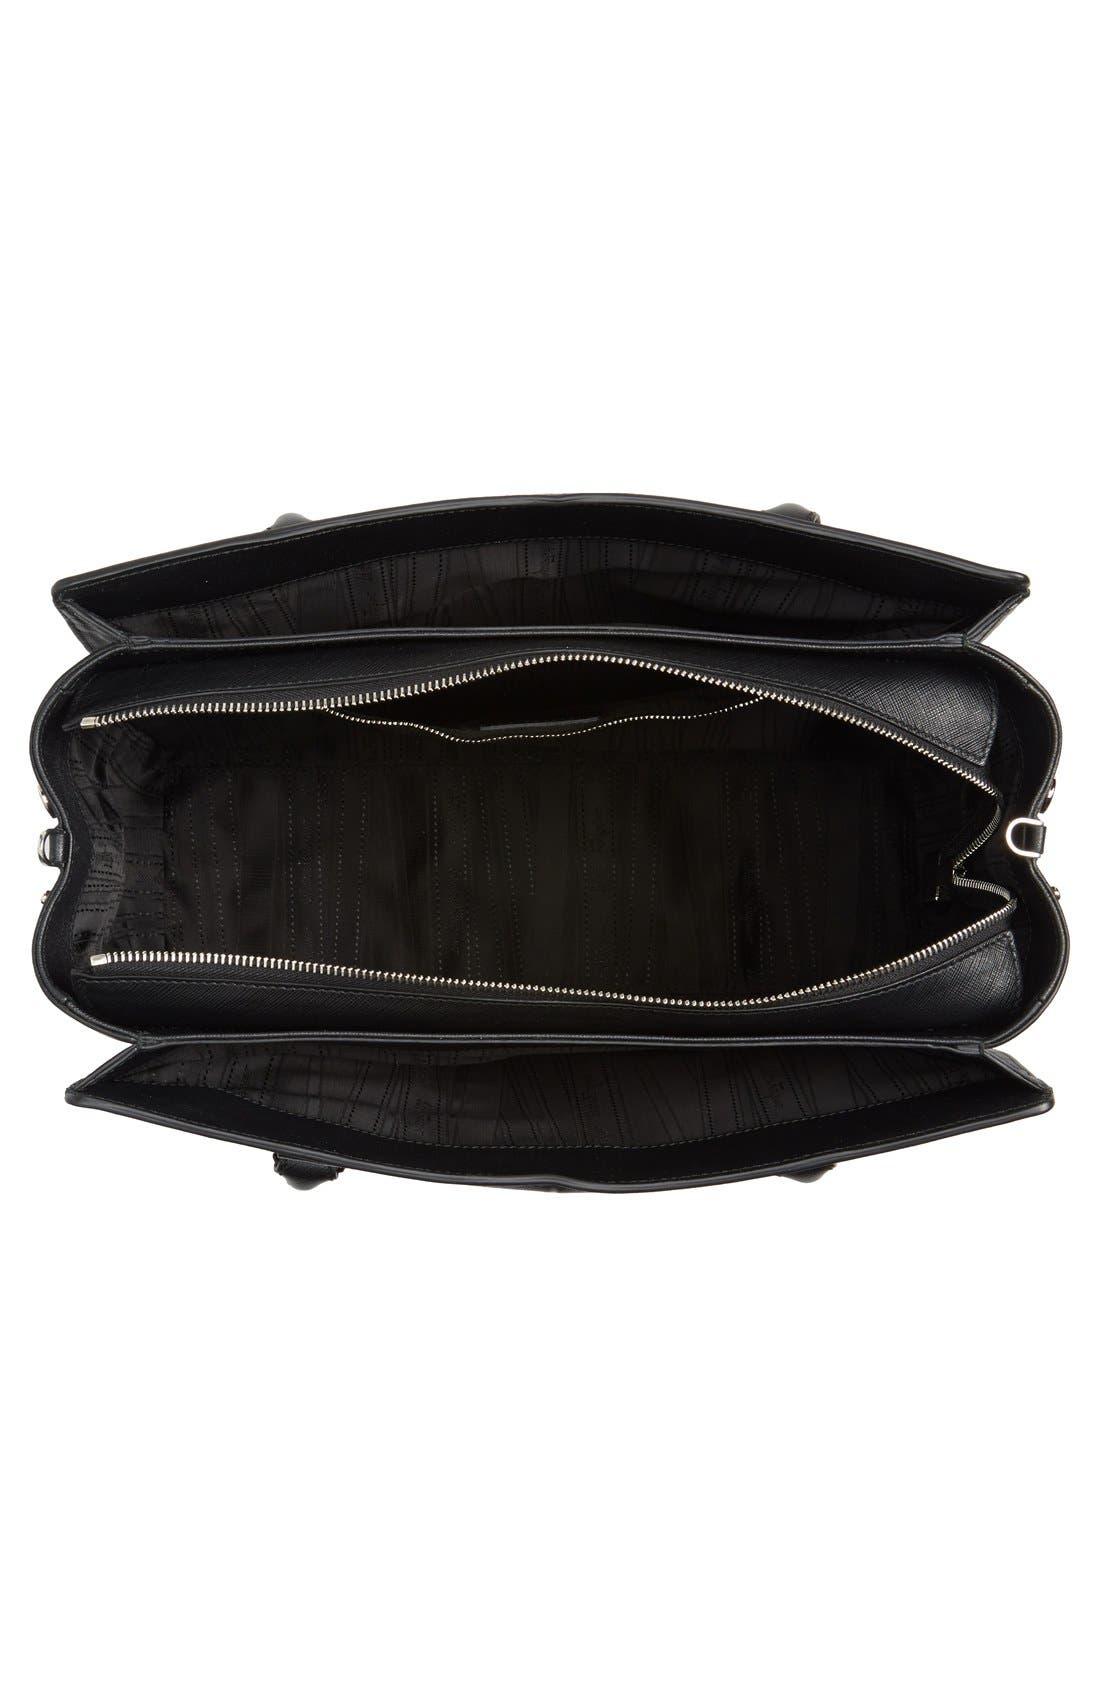 Medium Saffiano Leather Tote,                             Alternate thumbnail 2, color,                             001